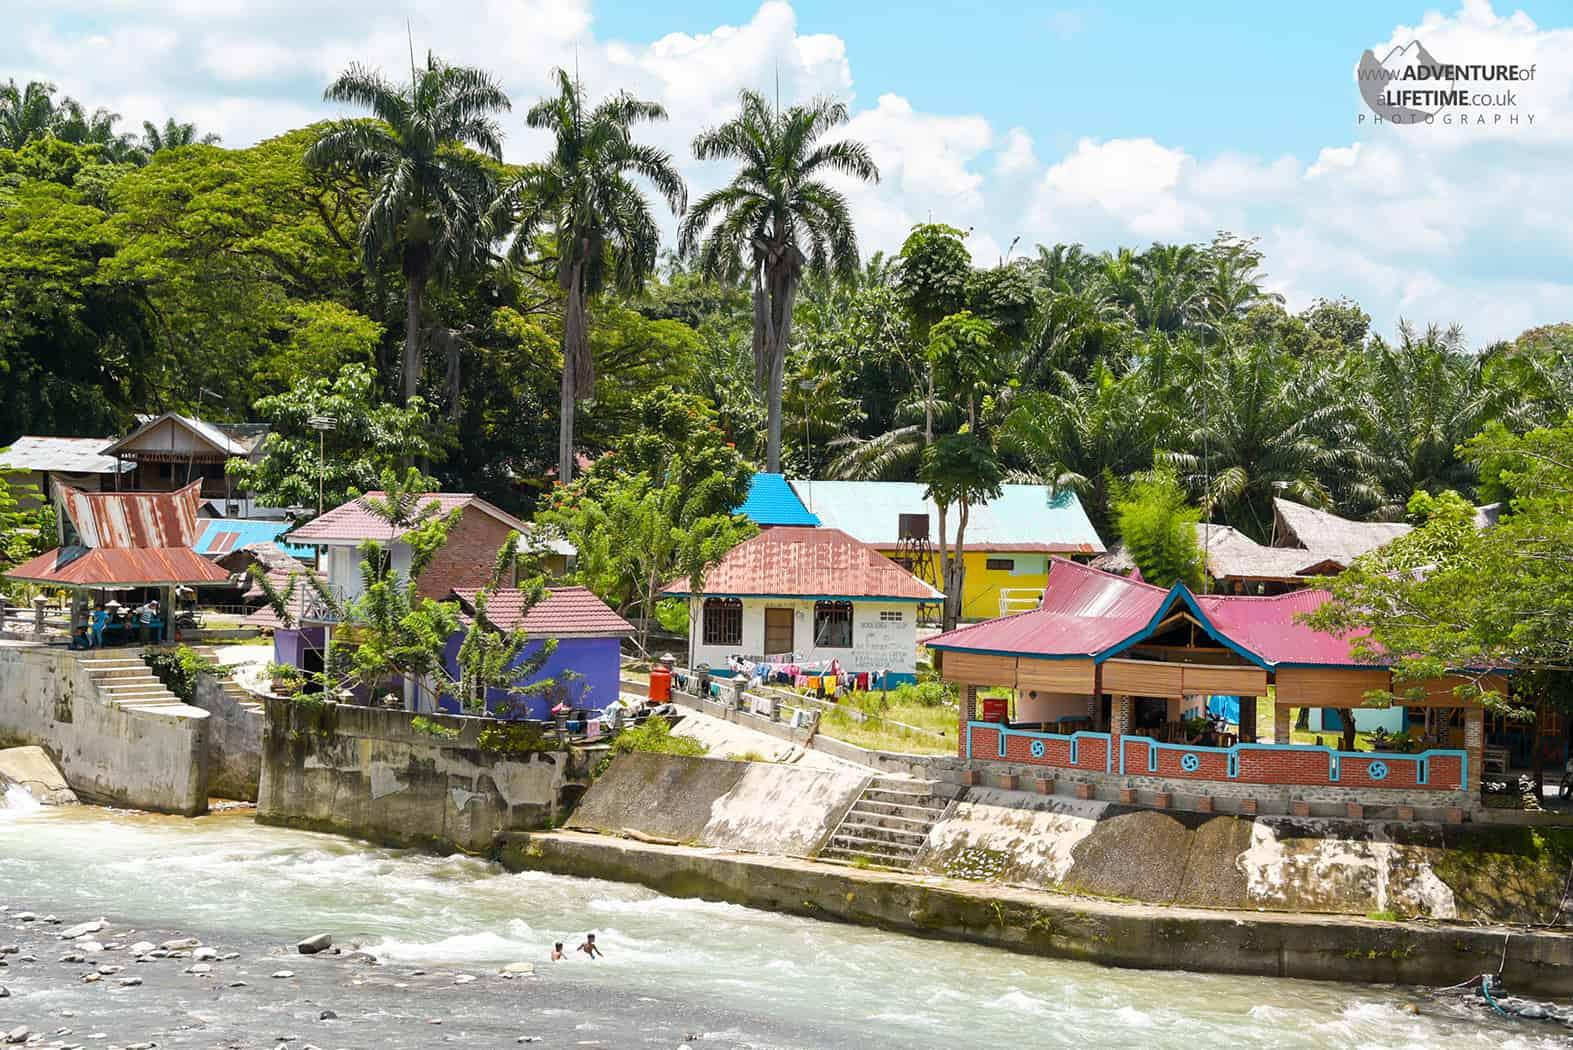 Bukit Lawang Villiage, North Sumatra